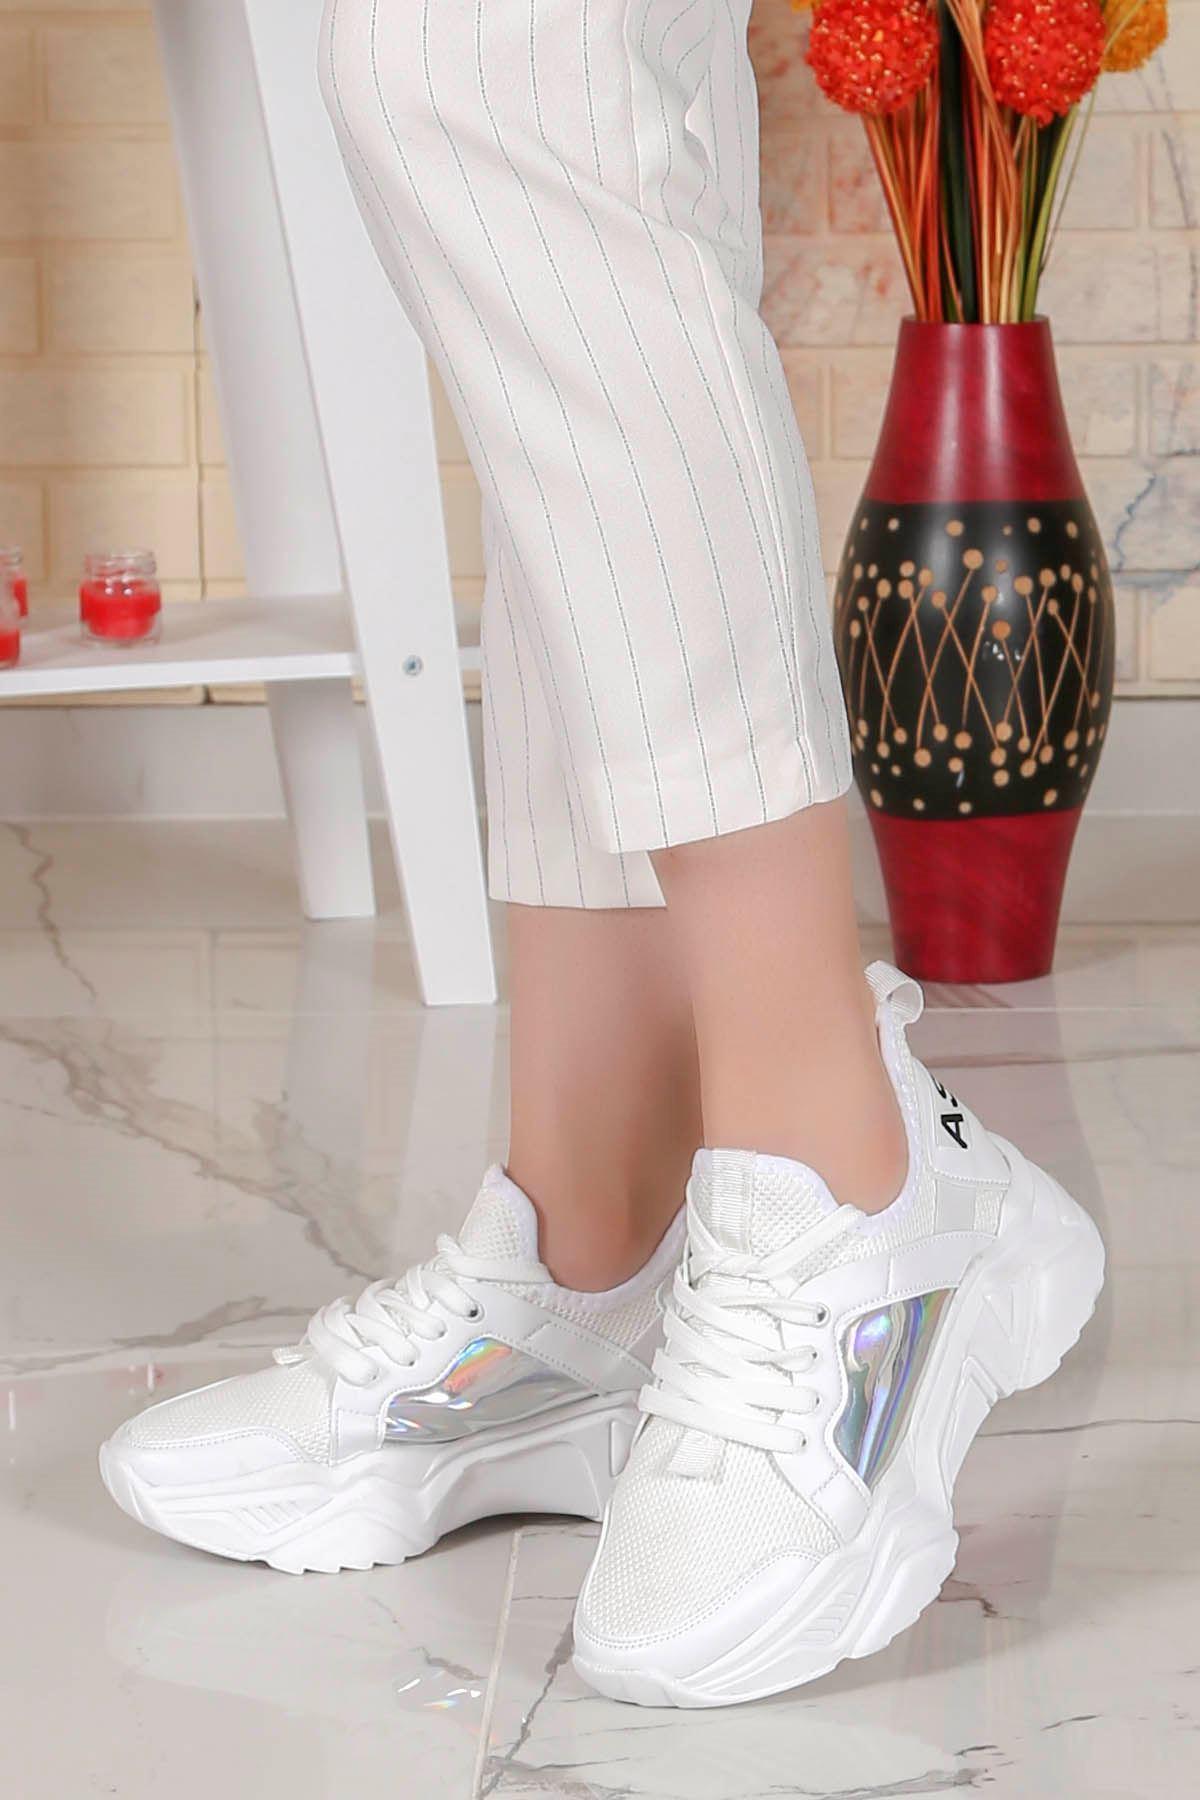 Örn-200 New Fashion  Beyaz Spor Hologram